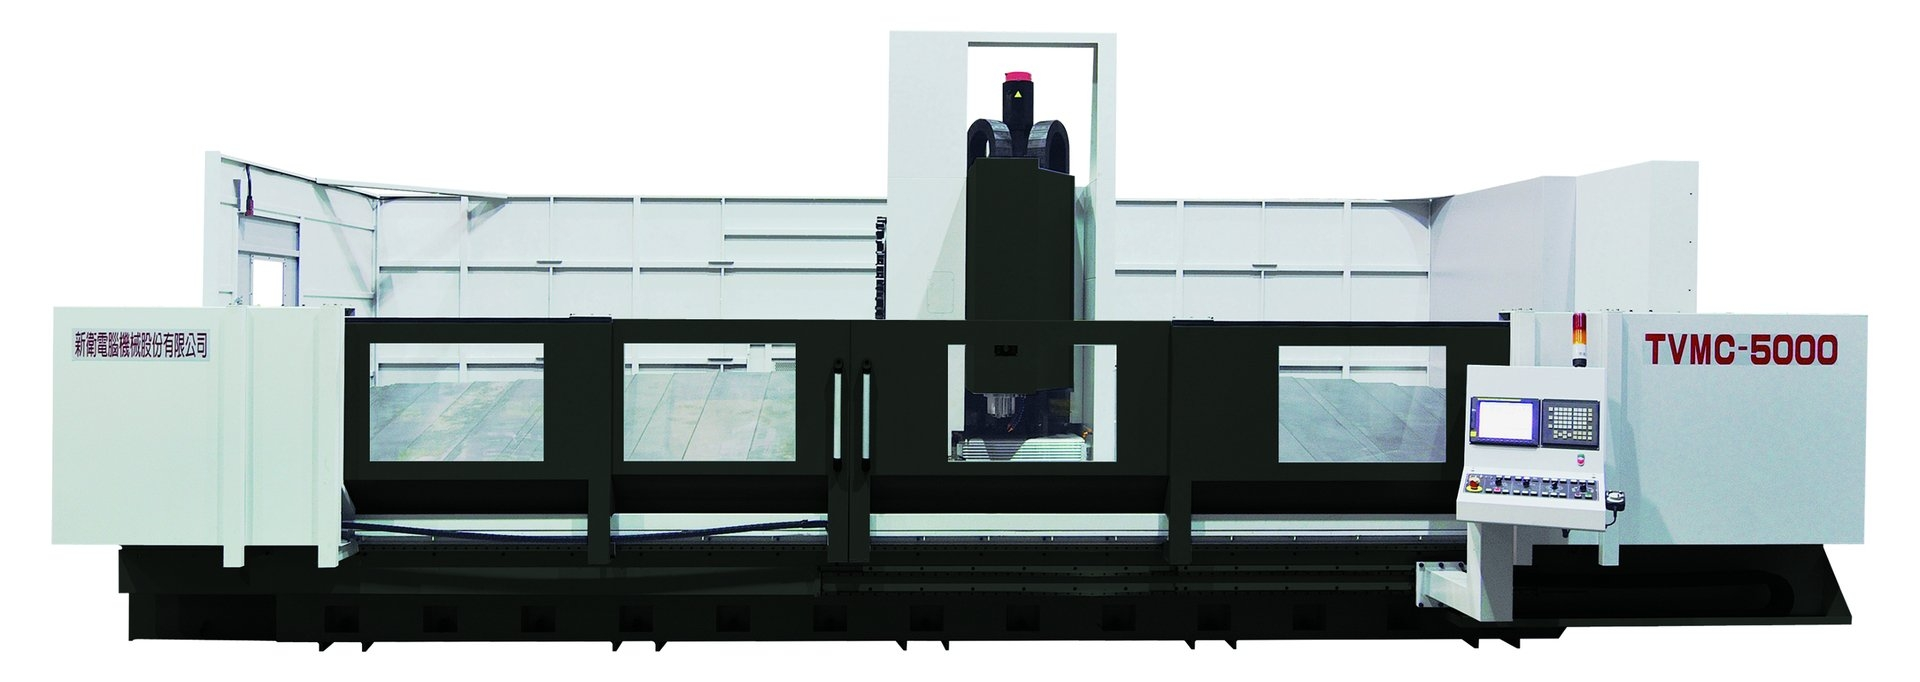 TVMC-5000, фото